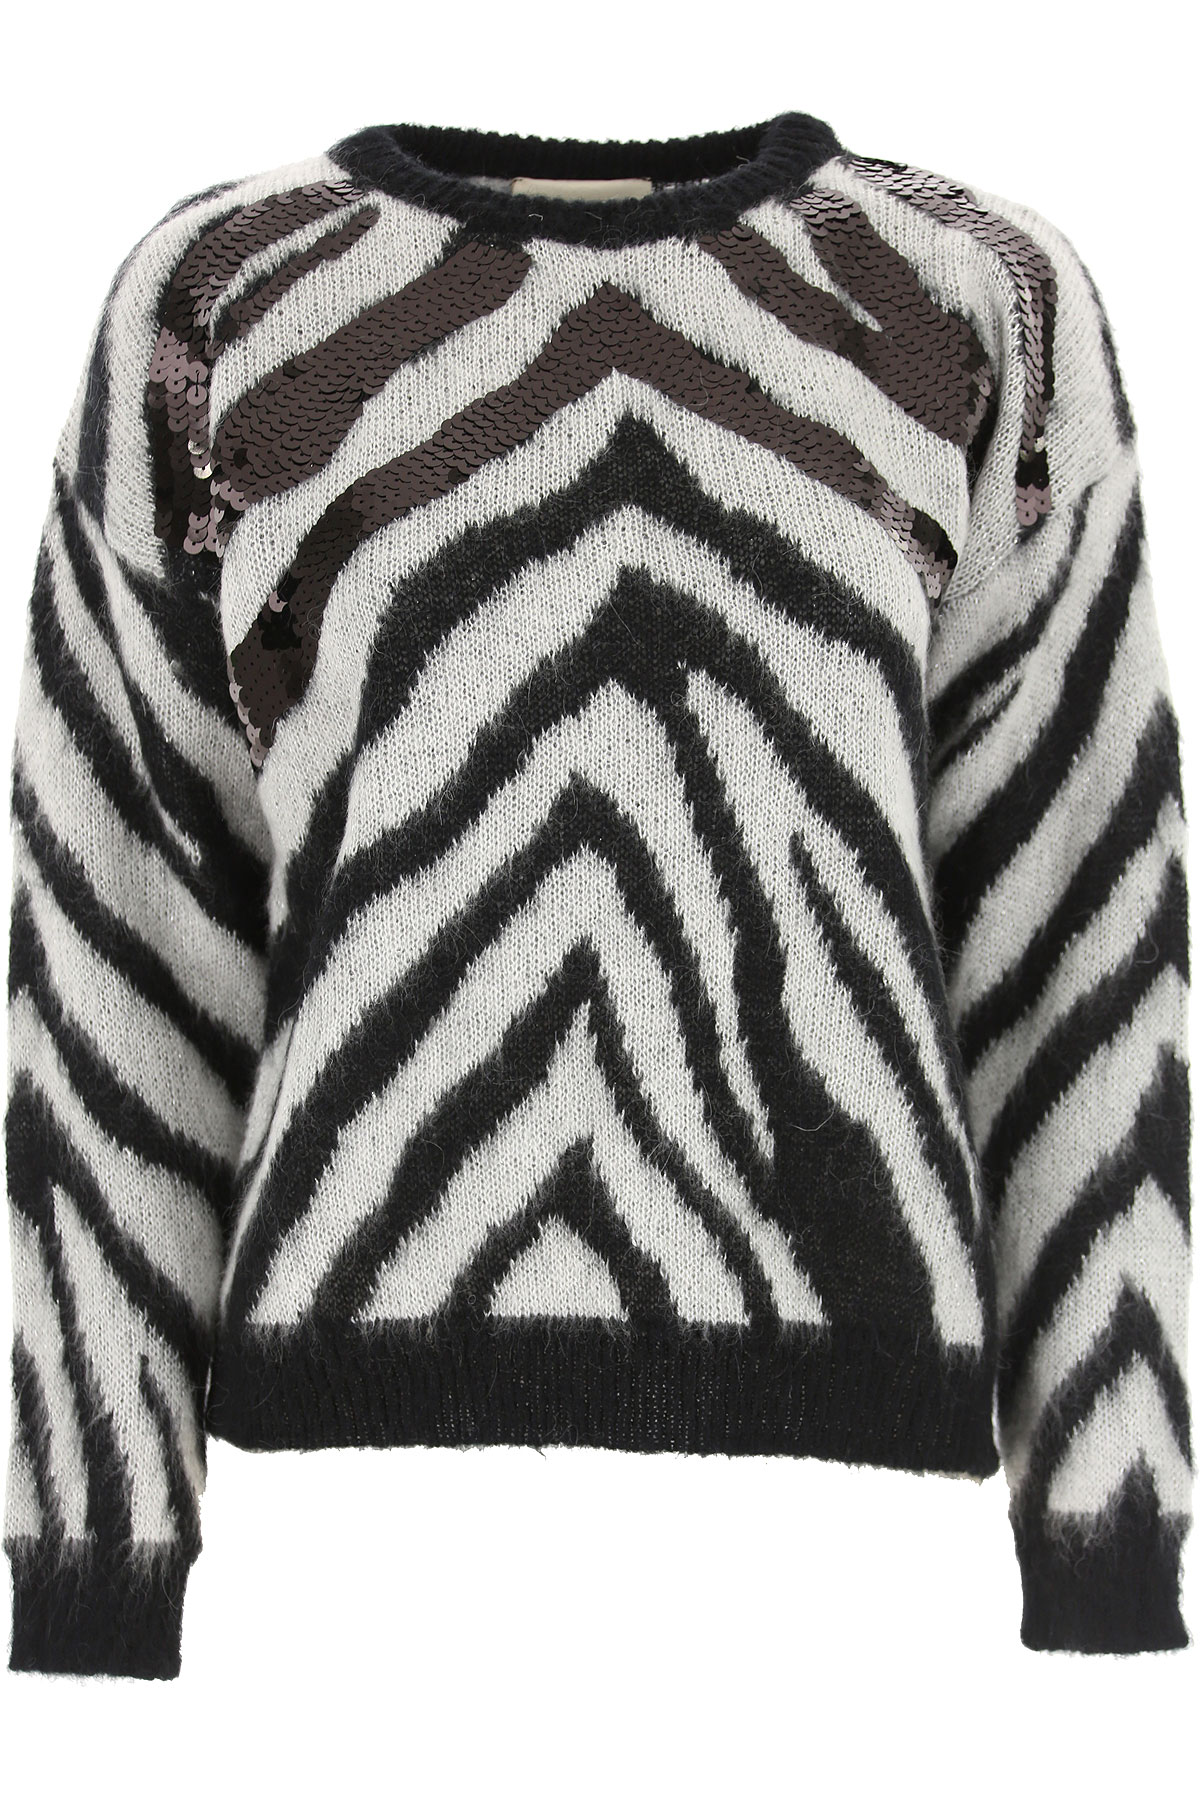 Aniye By Sweater for Women Jumper On Sale, Grey, Acrylic, 2019, 4 6